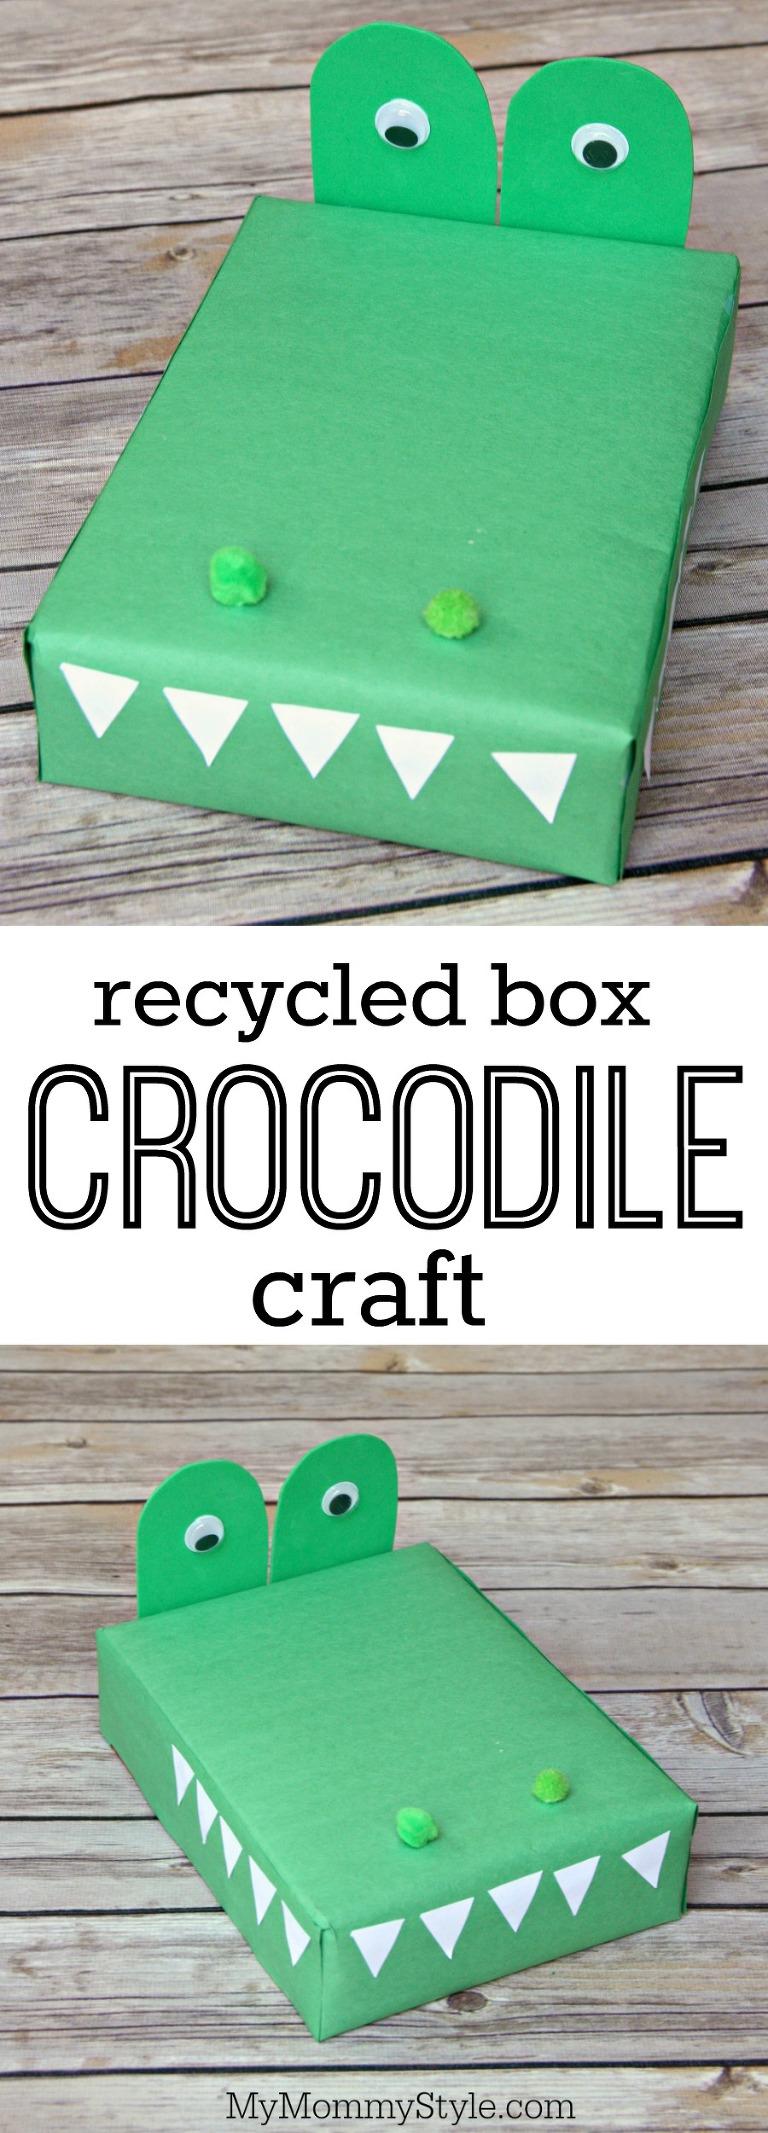 recyled box crocodile craft